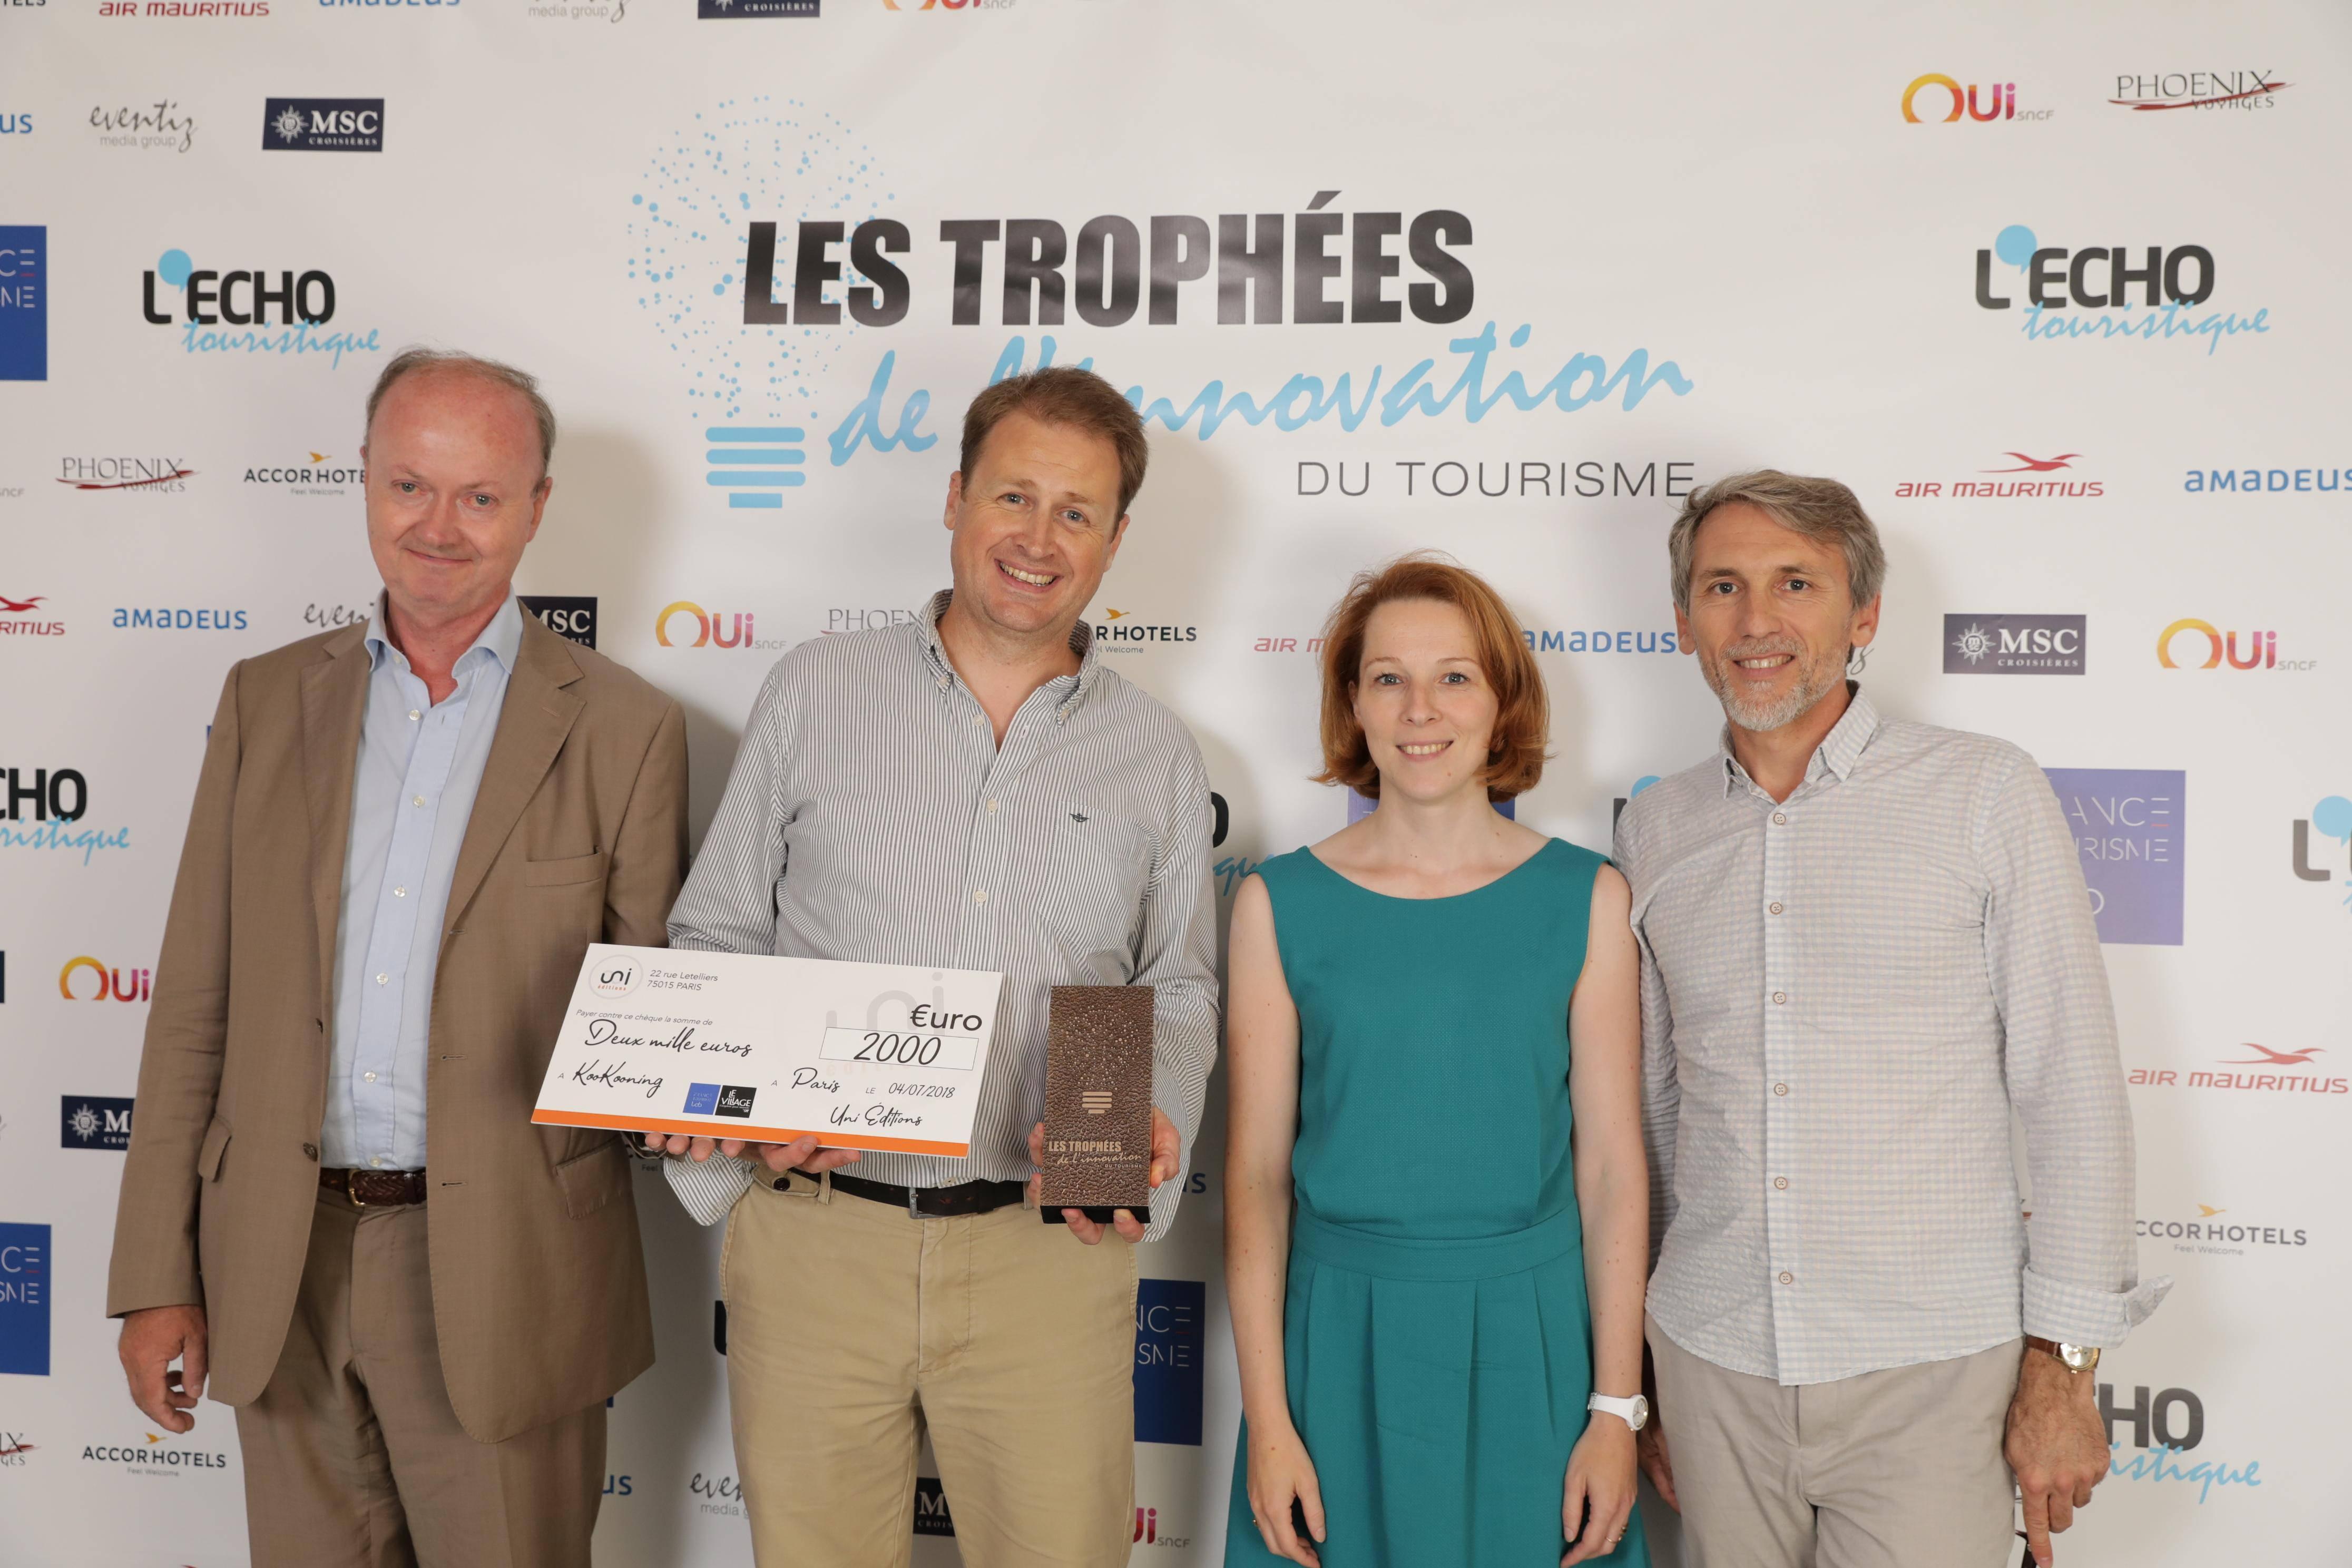 Trophee Innovation Touristique KooKooning Mise en Orbite